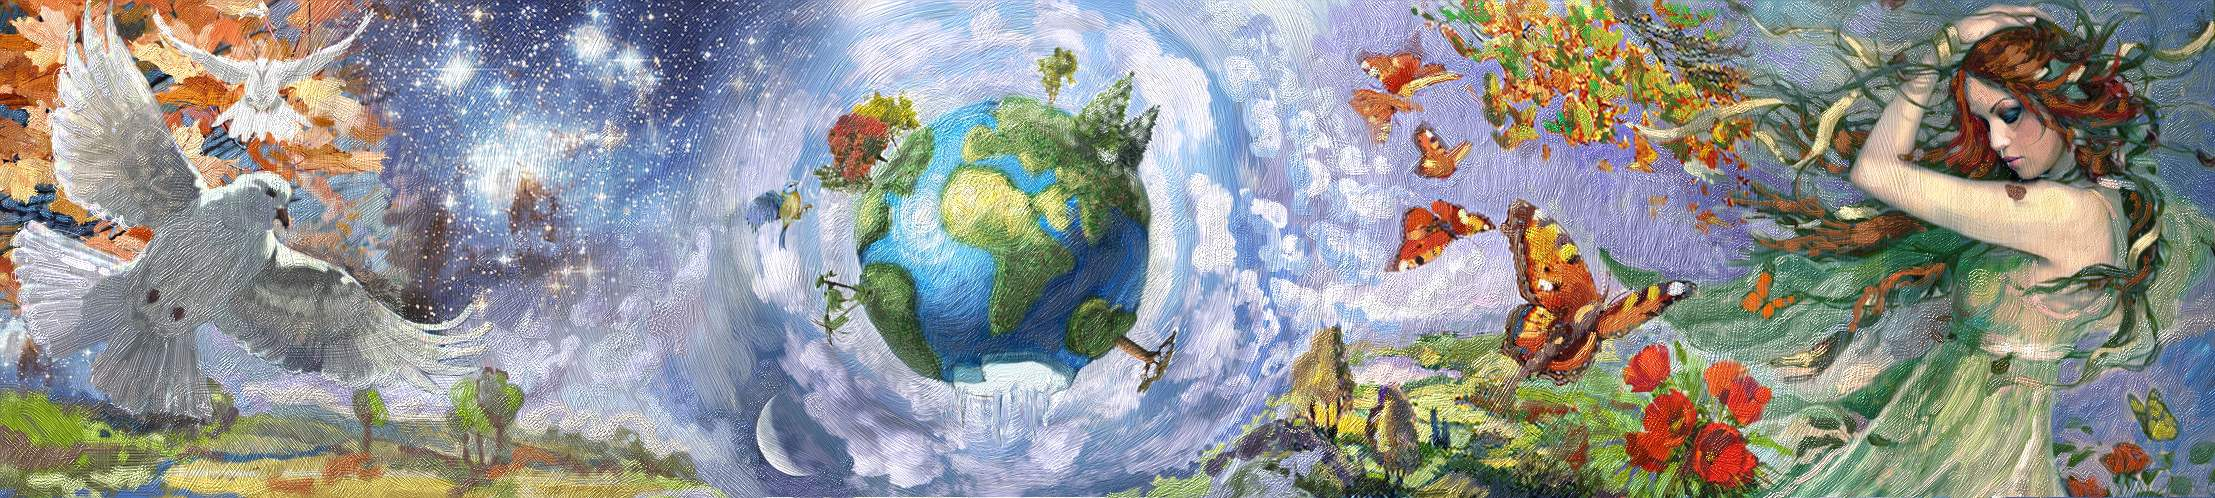 Mother Earth (cap site) by NikitaBolyakov